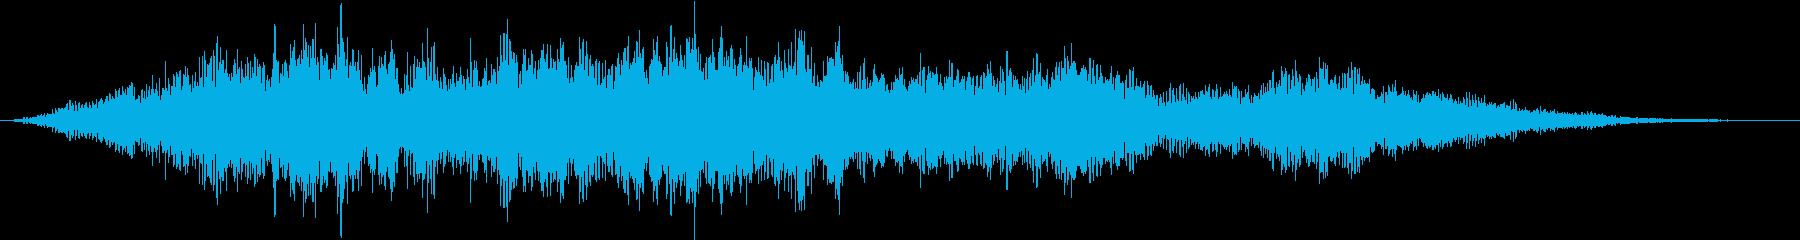 SF / 宇宙の世界的な音の再生済みの波形